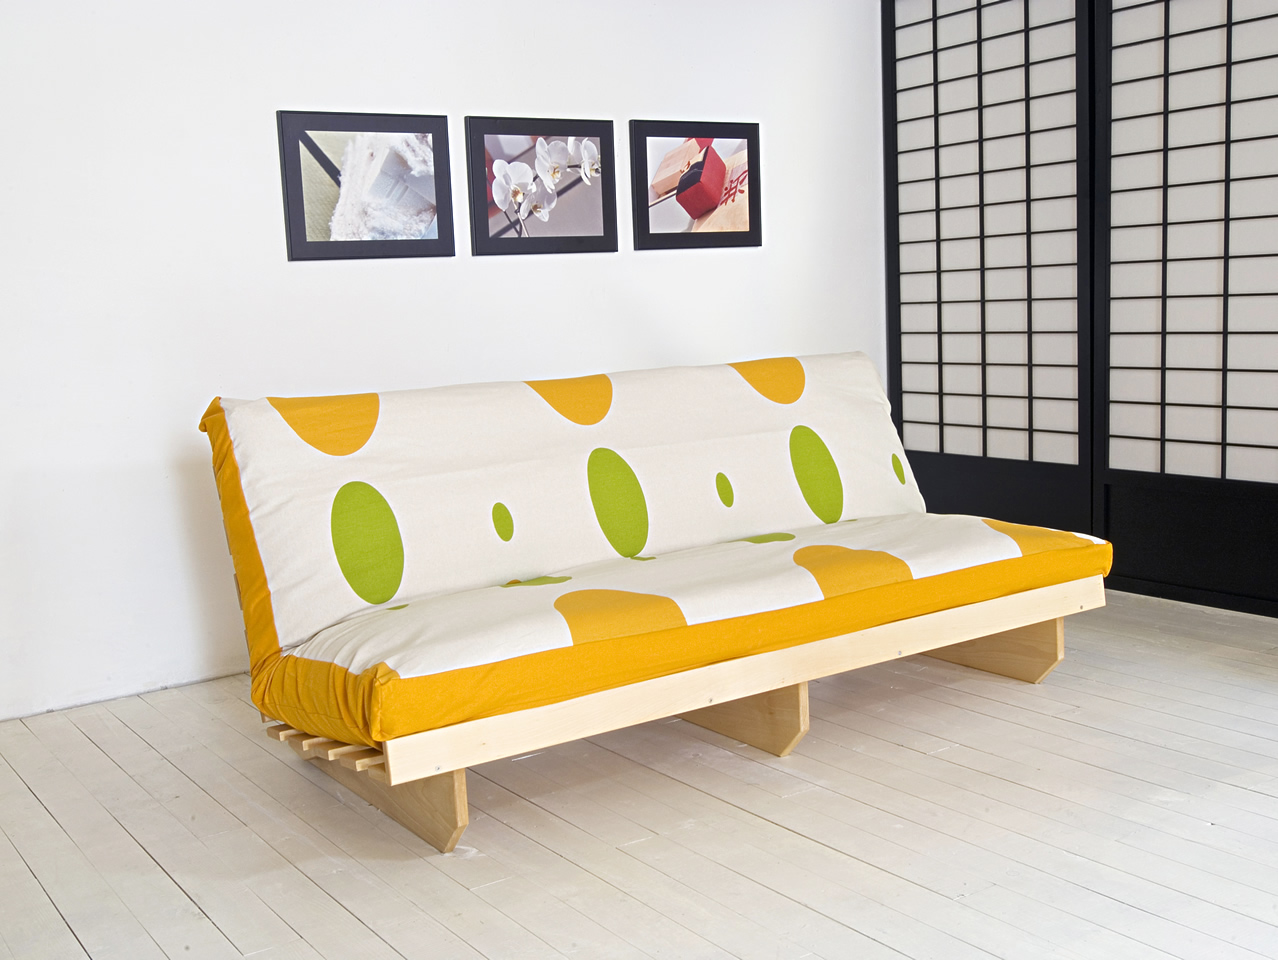 fundas para un sofa cama large round table futon sofá paiché  de madera